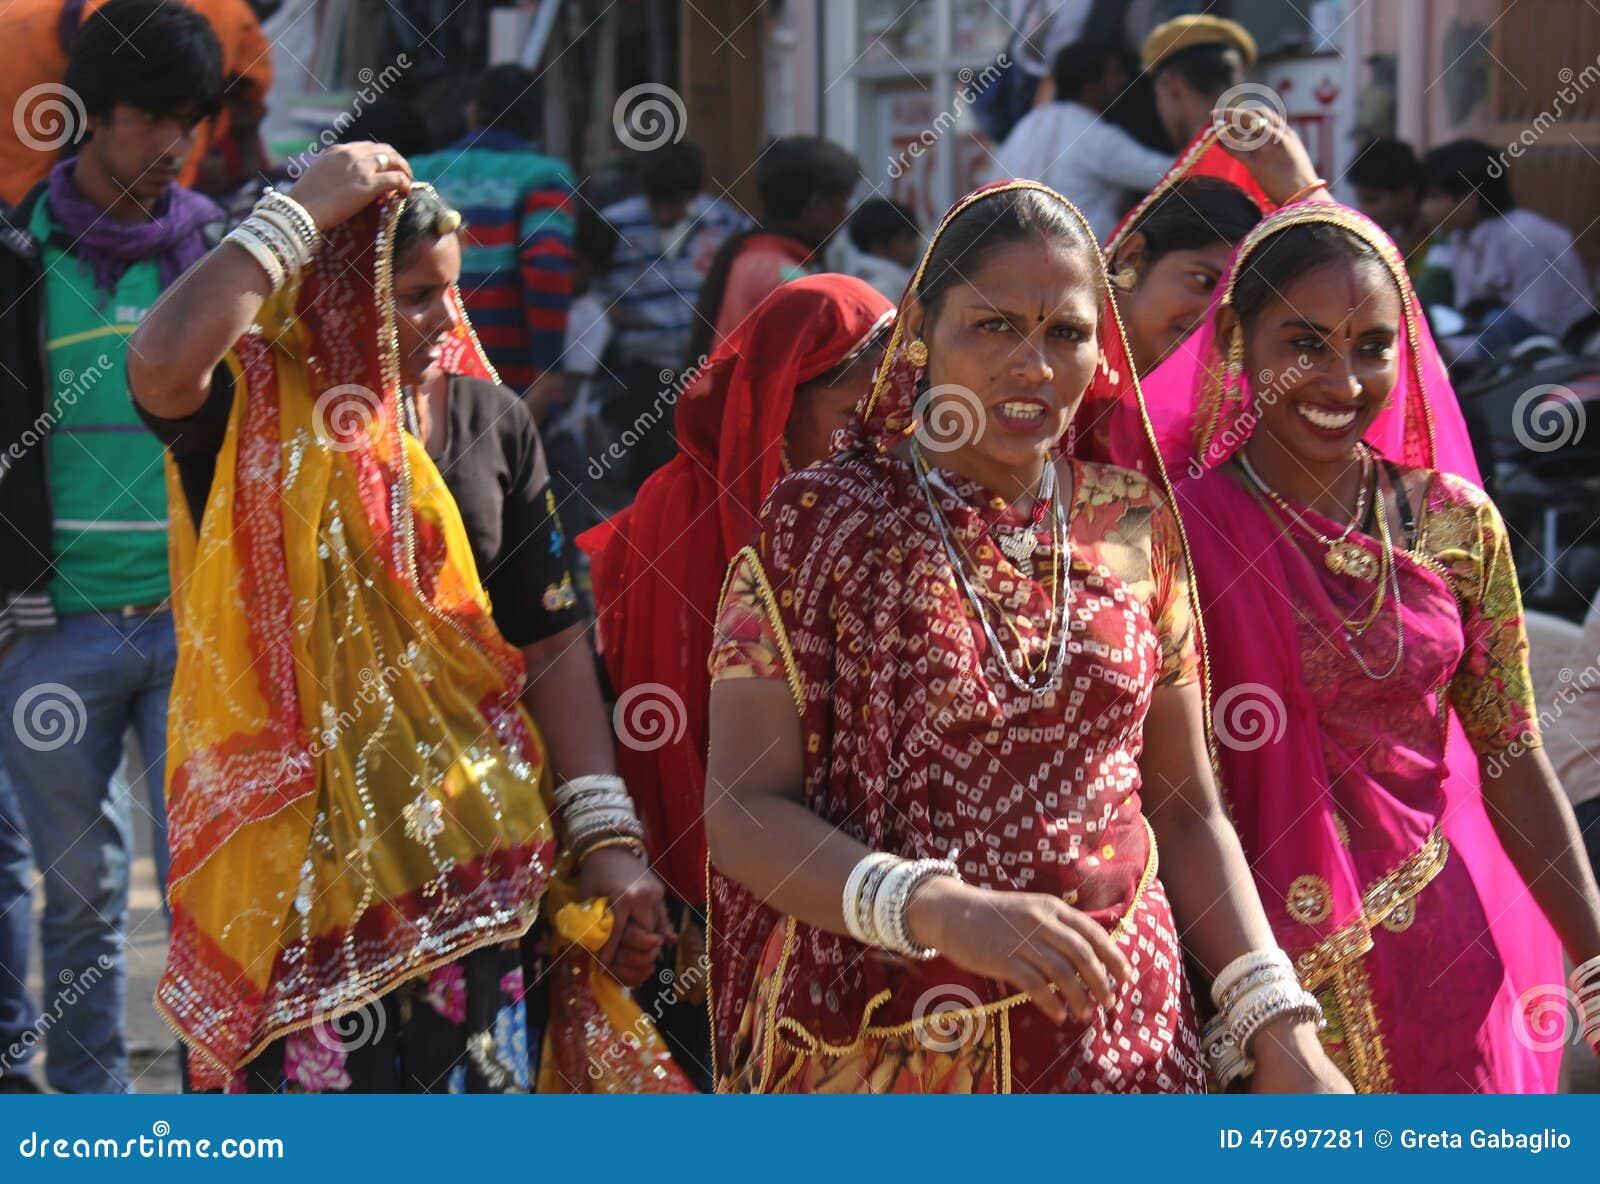 nude fair india babes